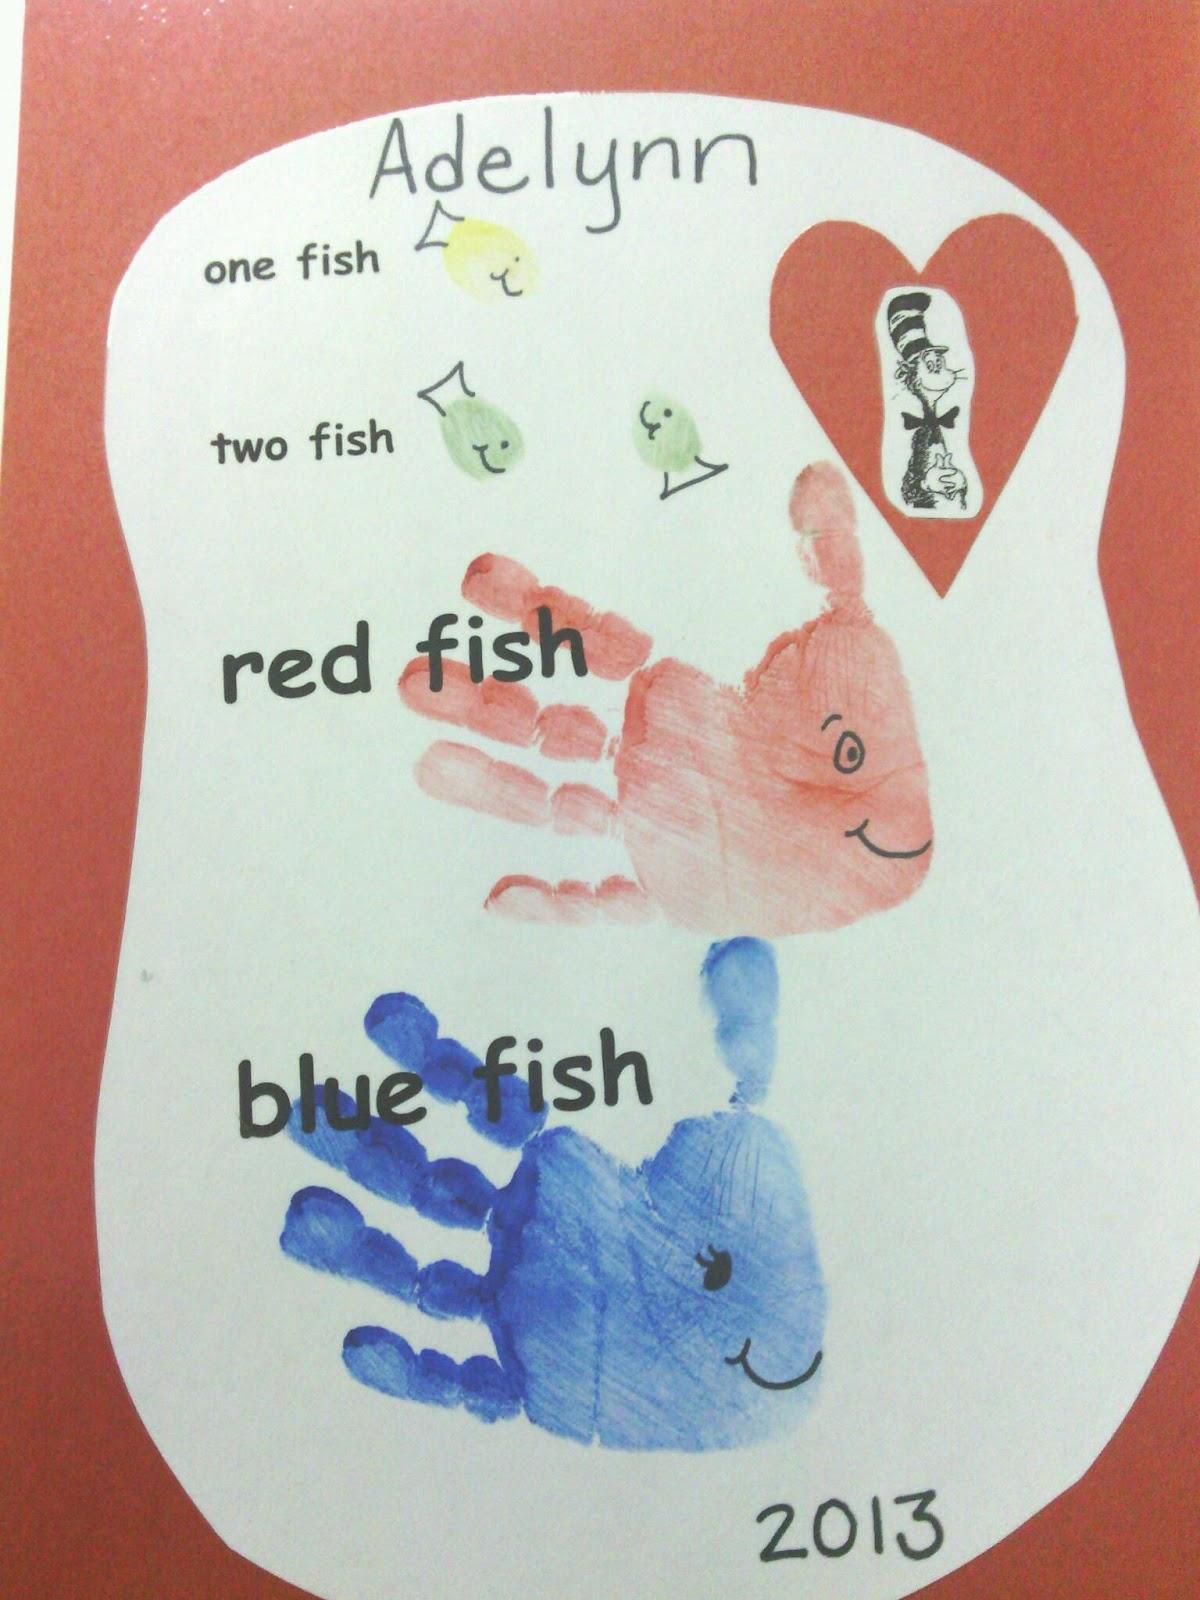 3 Year Old Fun 1 Fish 2 Fish Red Fish Blue Fish